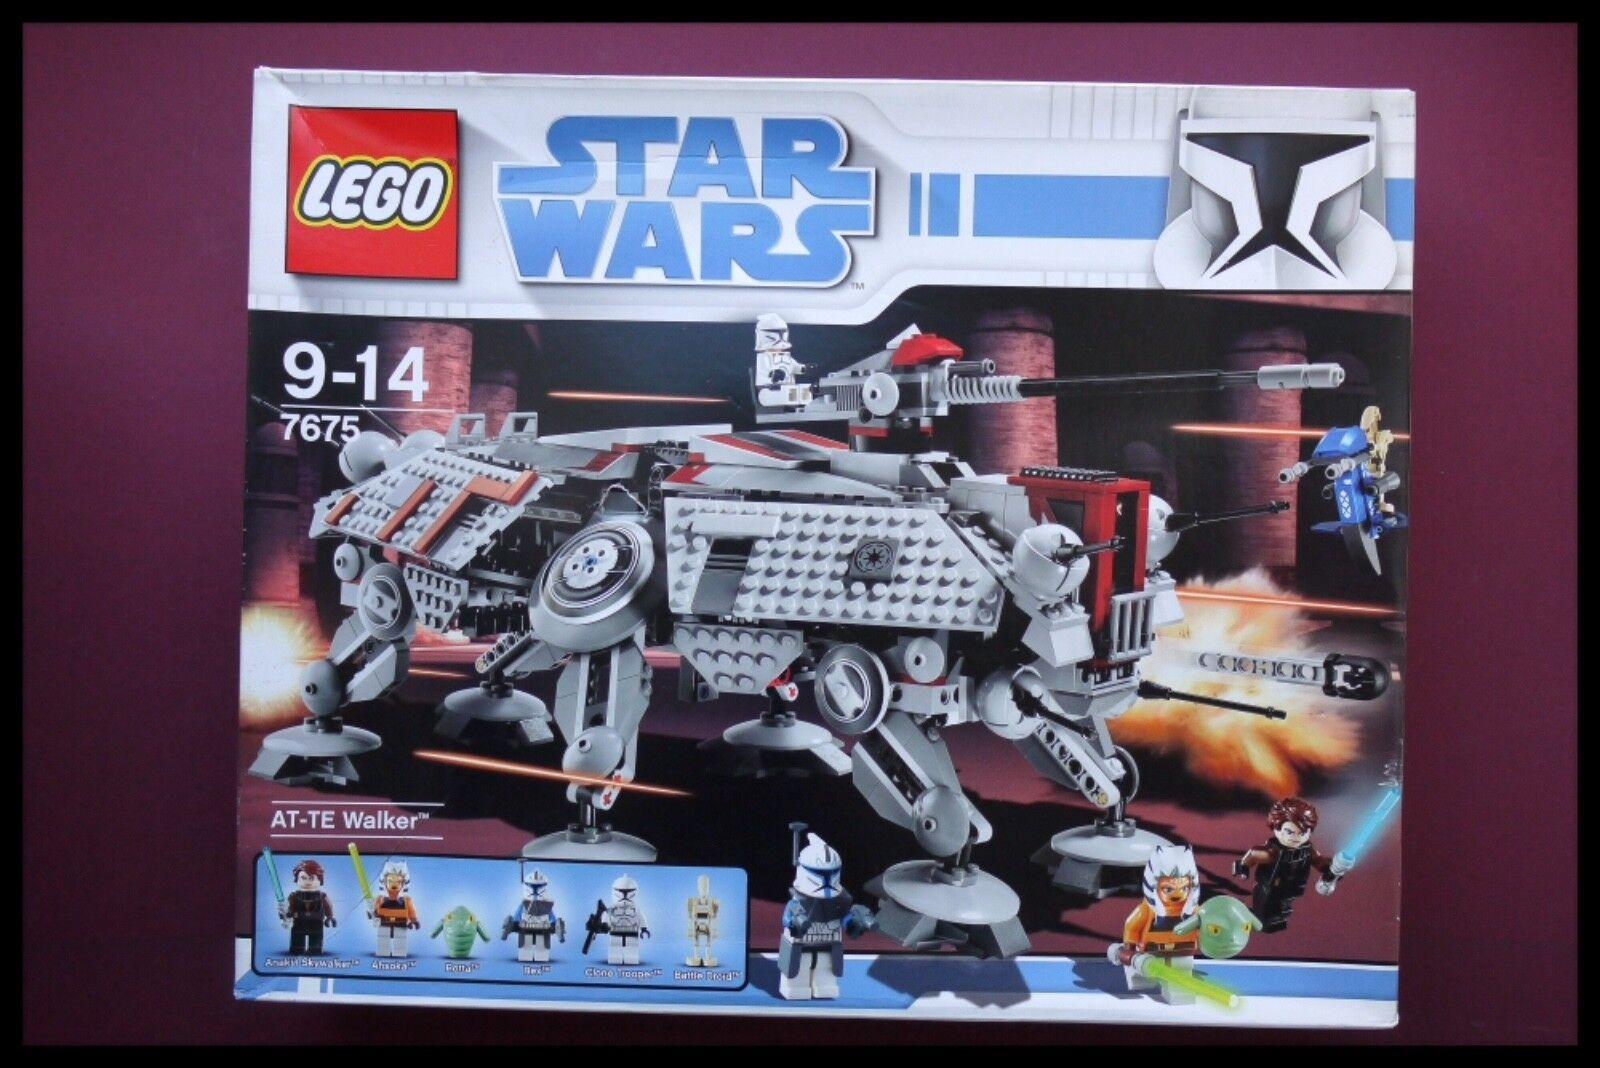 LEGO  estrella guerras 7675 at-te Walker  Clone guerras  in pensione, estremamente raro non aperto  consegna rapida